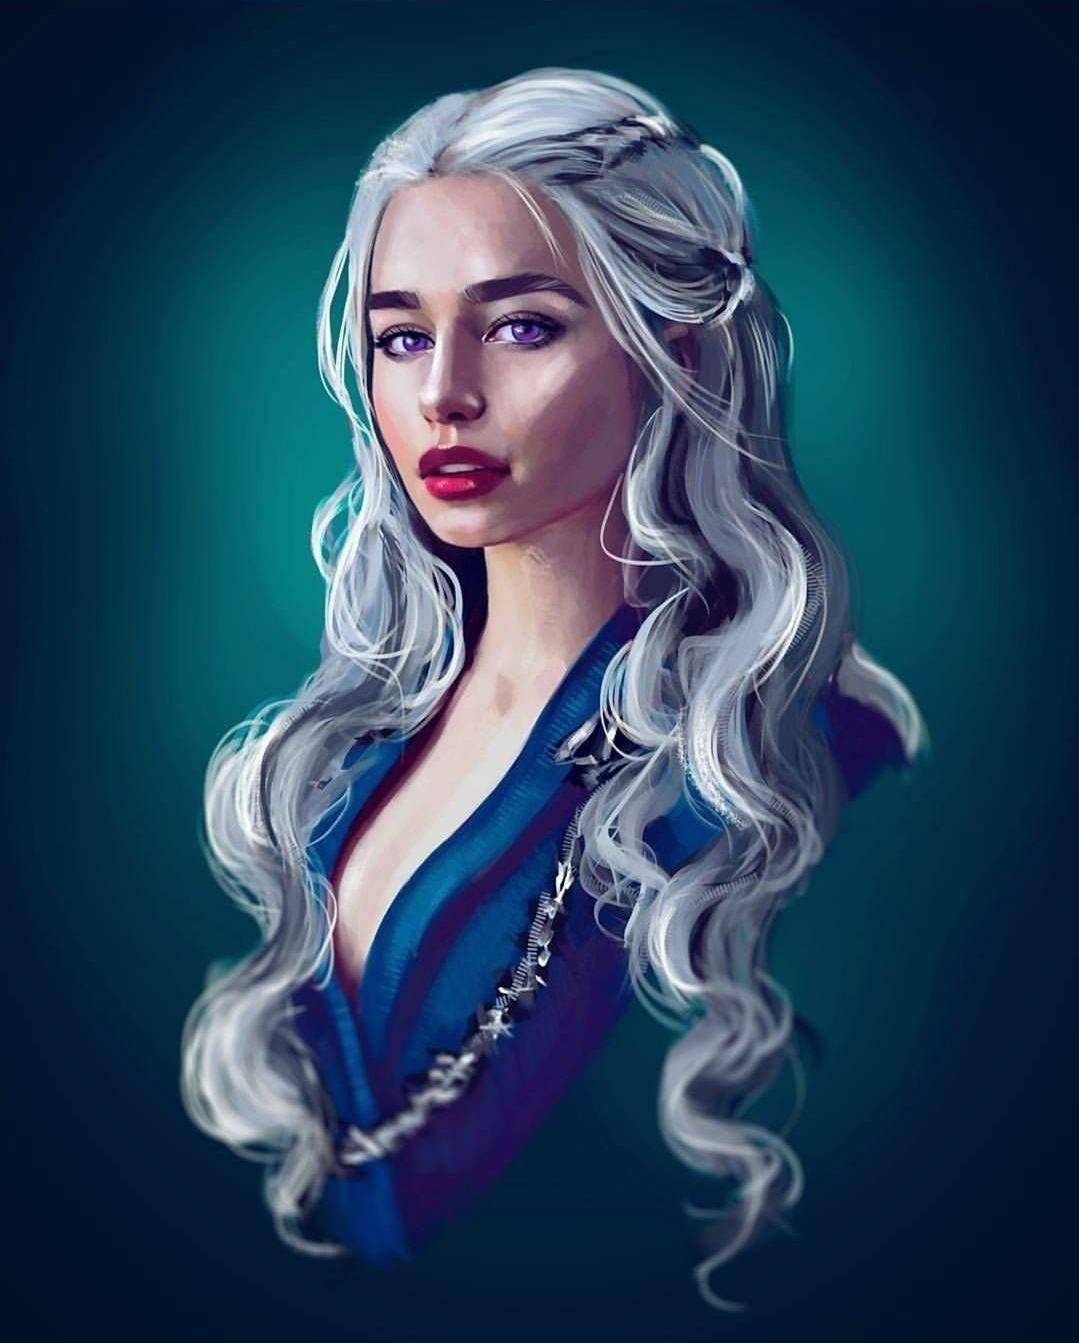 Precise Game Of Thrones Deanerys Targaryen Original Art Jon Snow Dragons Emilia Clarke Collectibles